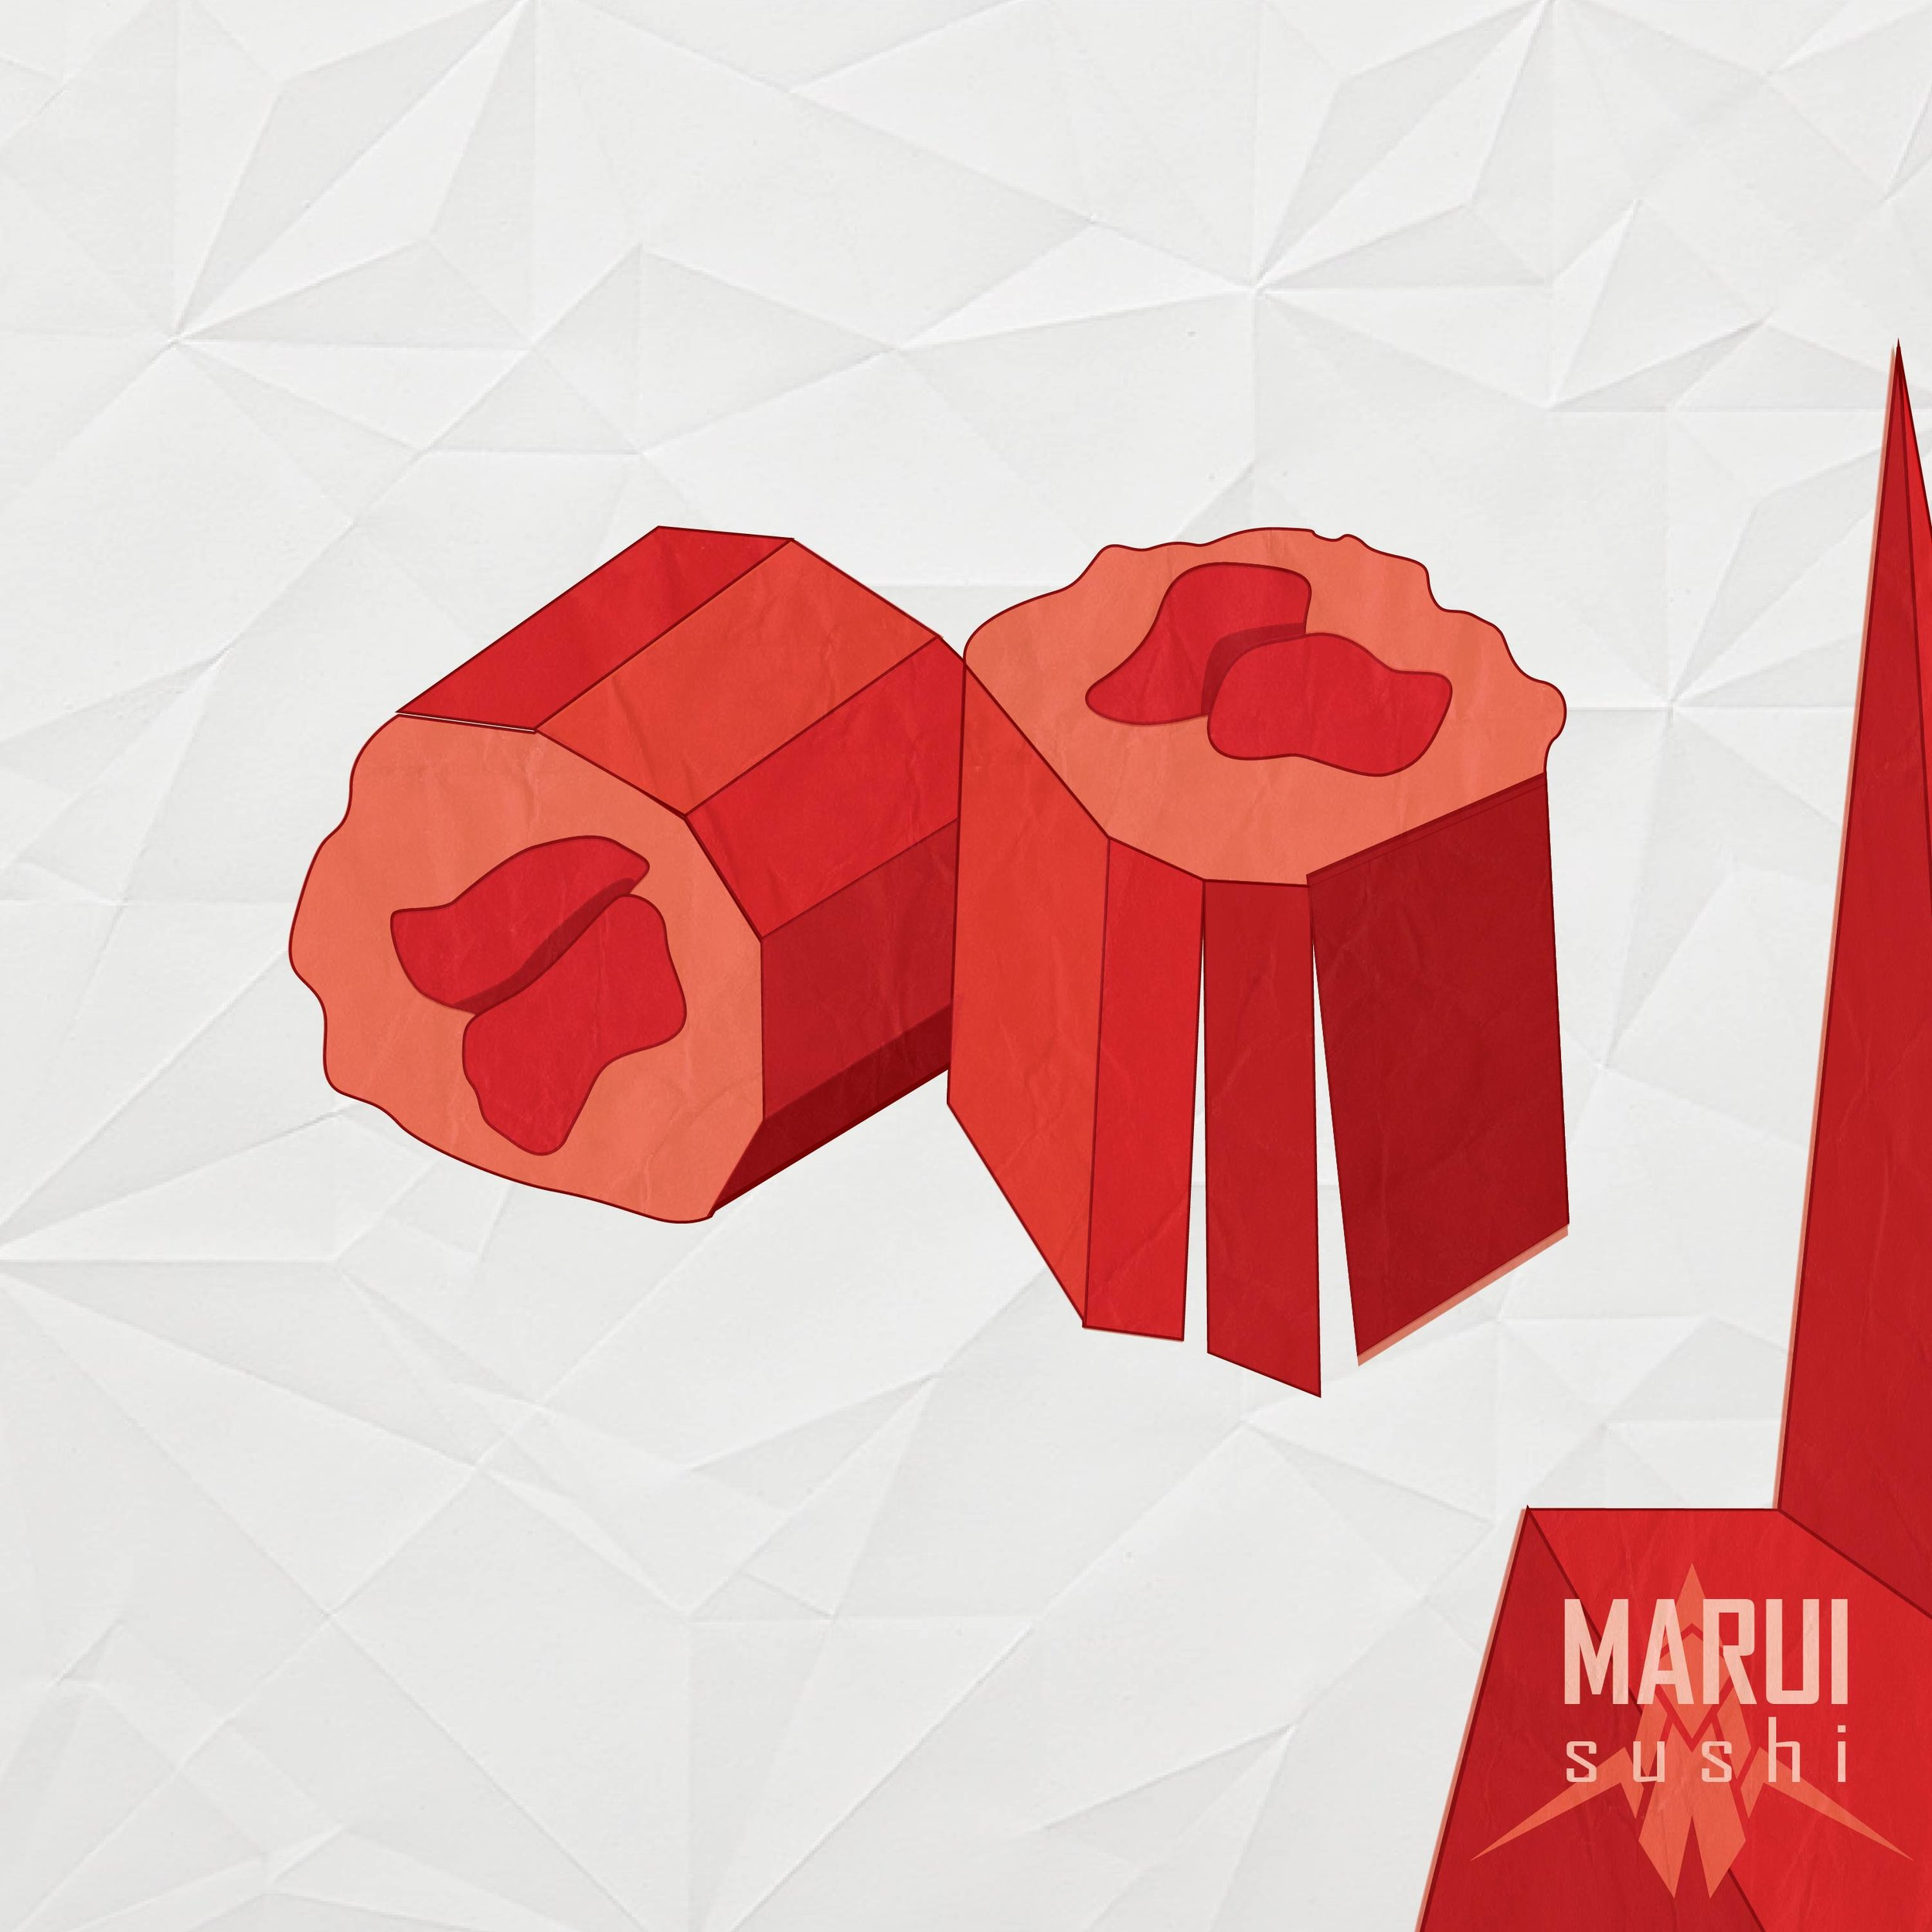 Marui Sushi Instagram Ads 3/6